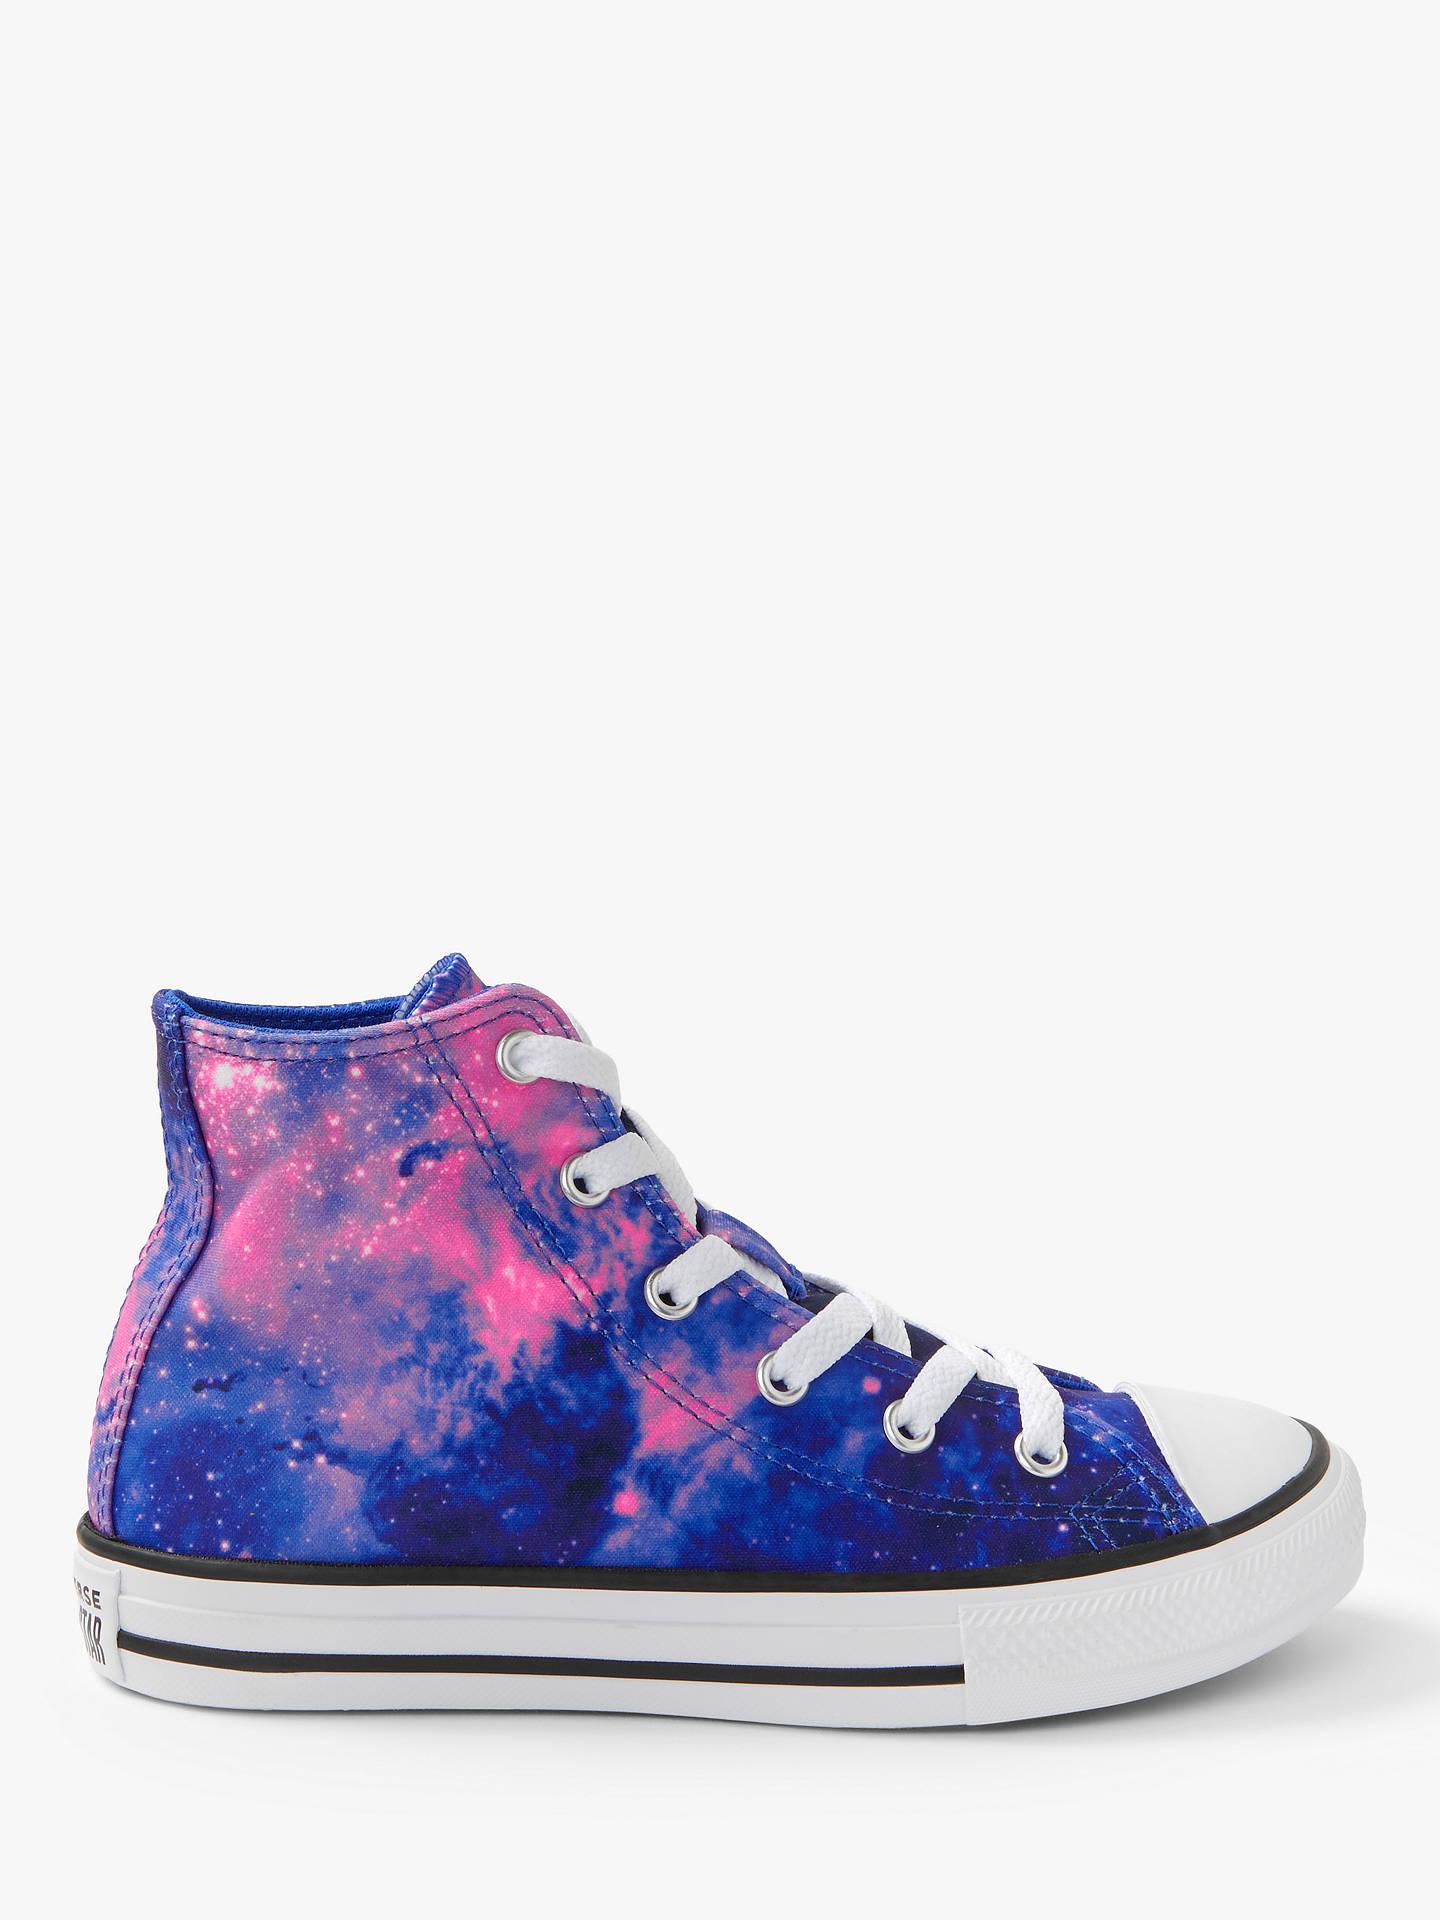 a05cbf20942dc Converse Children's All Star Miss Galaxy Hi-Top Trainers, Purple/Pink